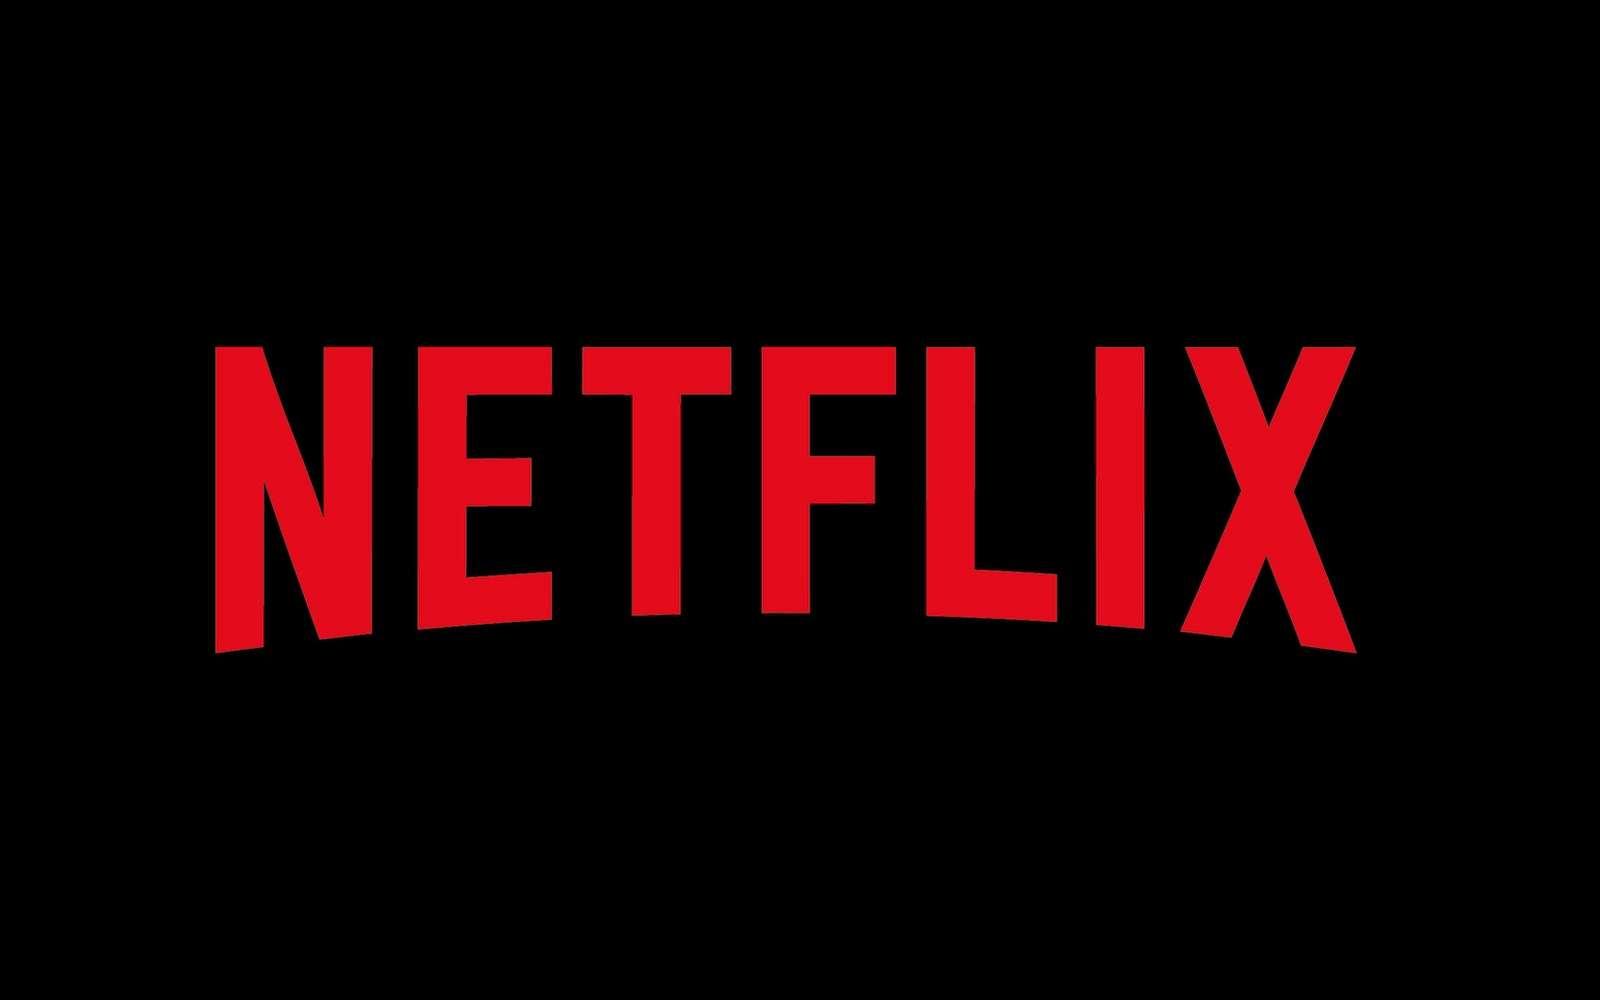 Le jeu vidéo sera-t-il le prochain eldorado de Netflix ? © Netflix